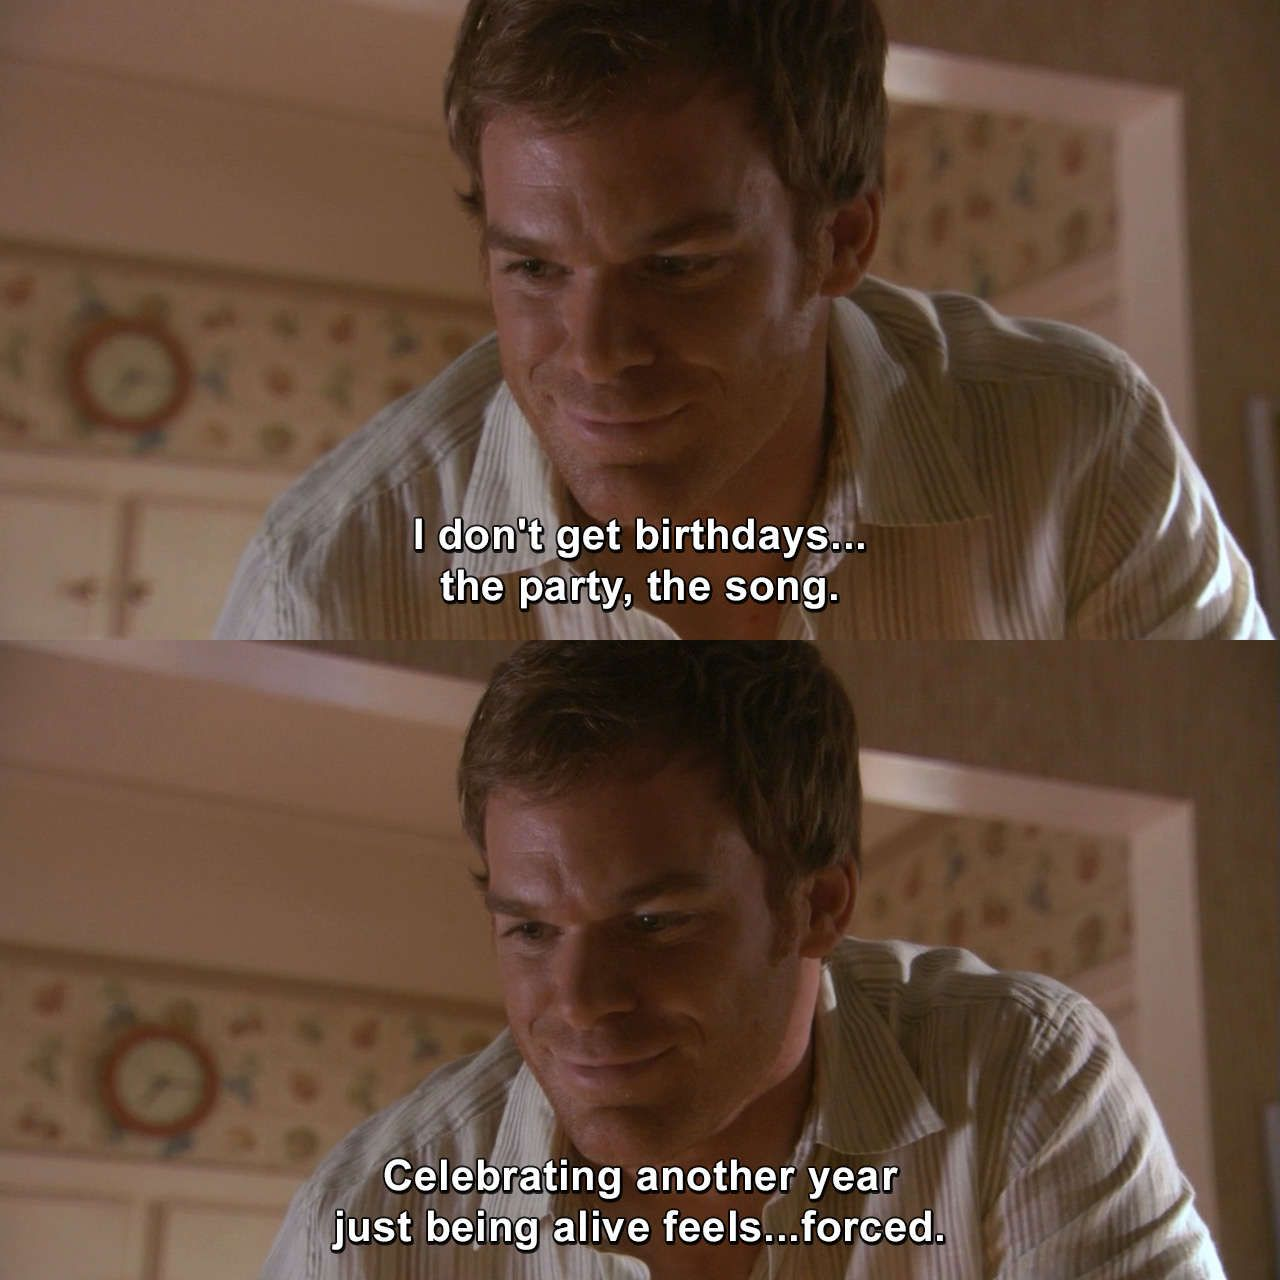 Dexter Return To Sender Dextermorgan Dexter Returntosender Tv Laugh Dexter Quotes Dexter Morgan Quotes Dexter Funny